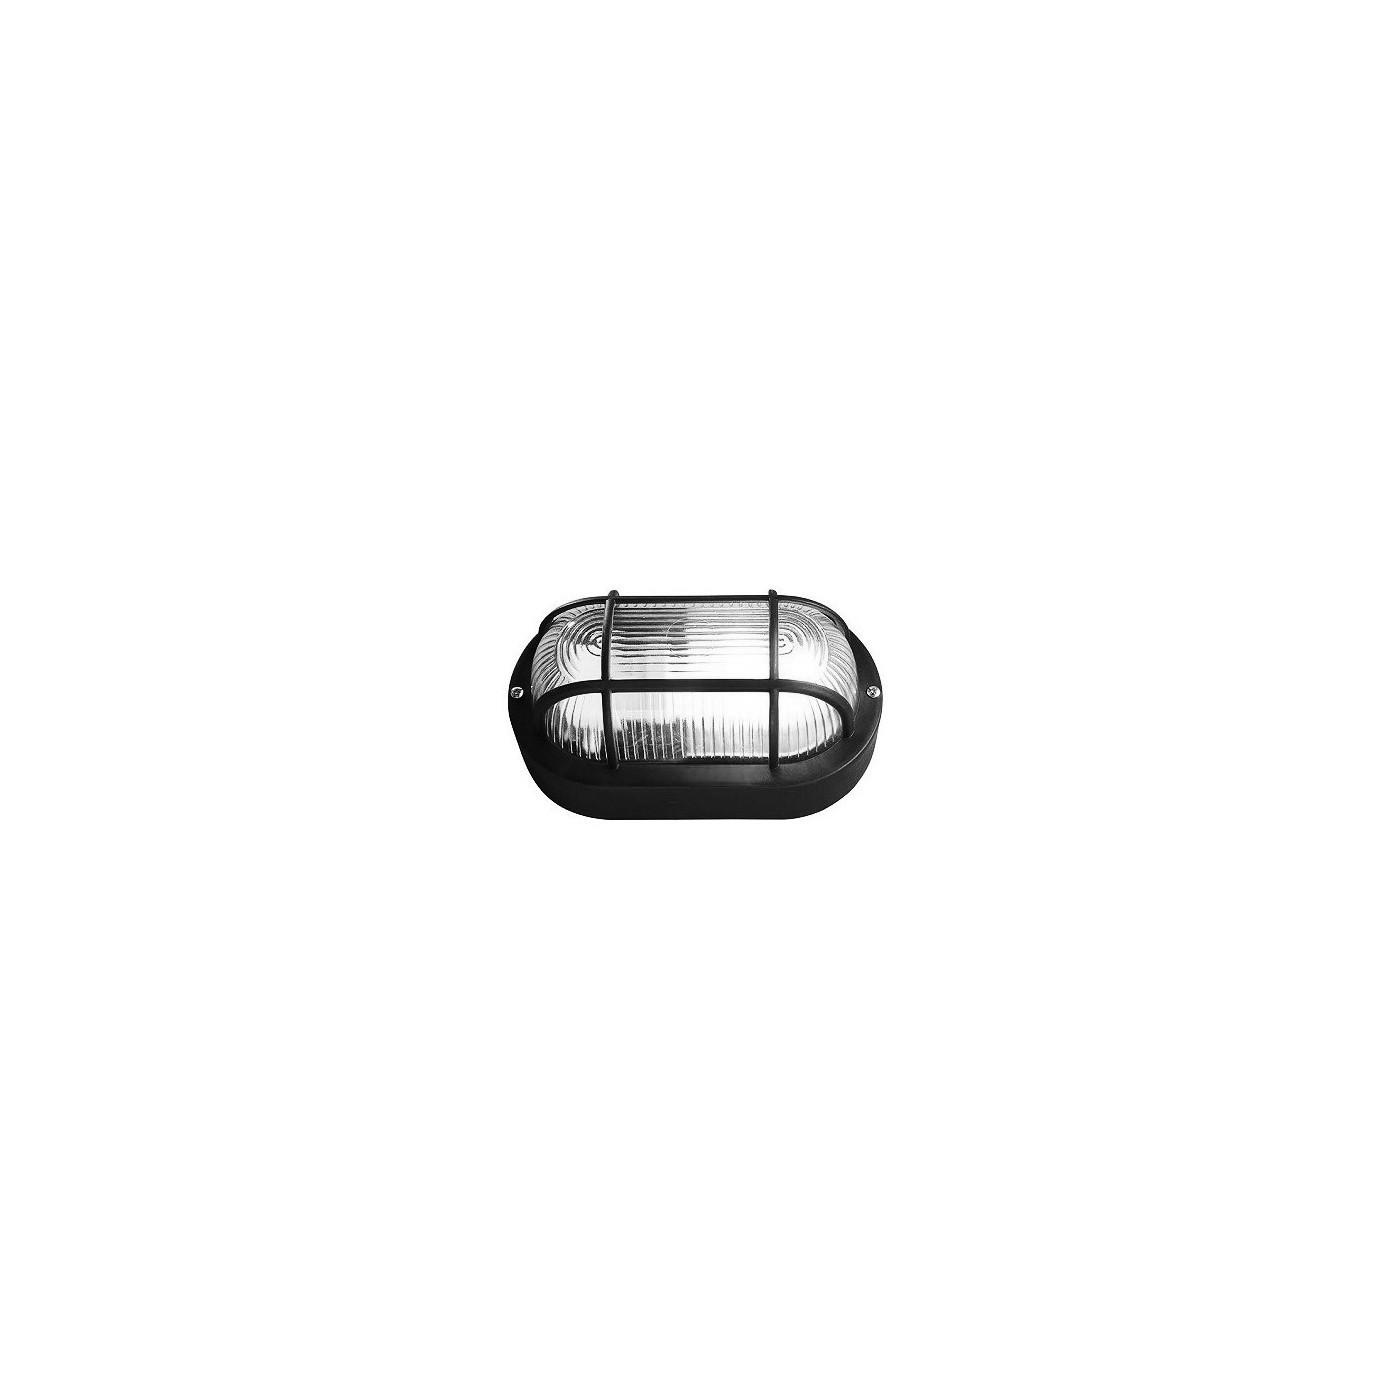 Lampada Bullseye (bulleye), E27 nera, aspetto industriale